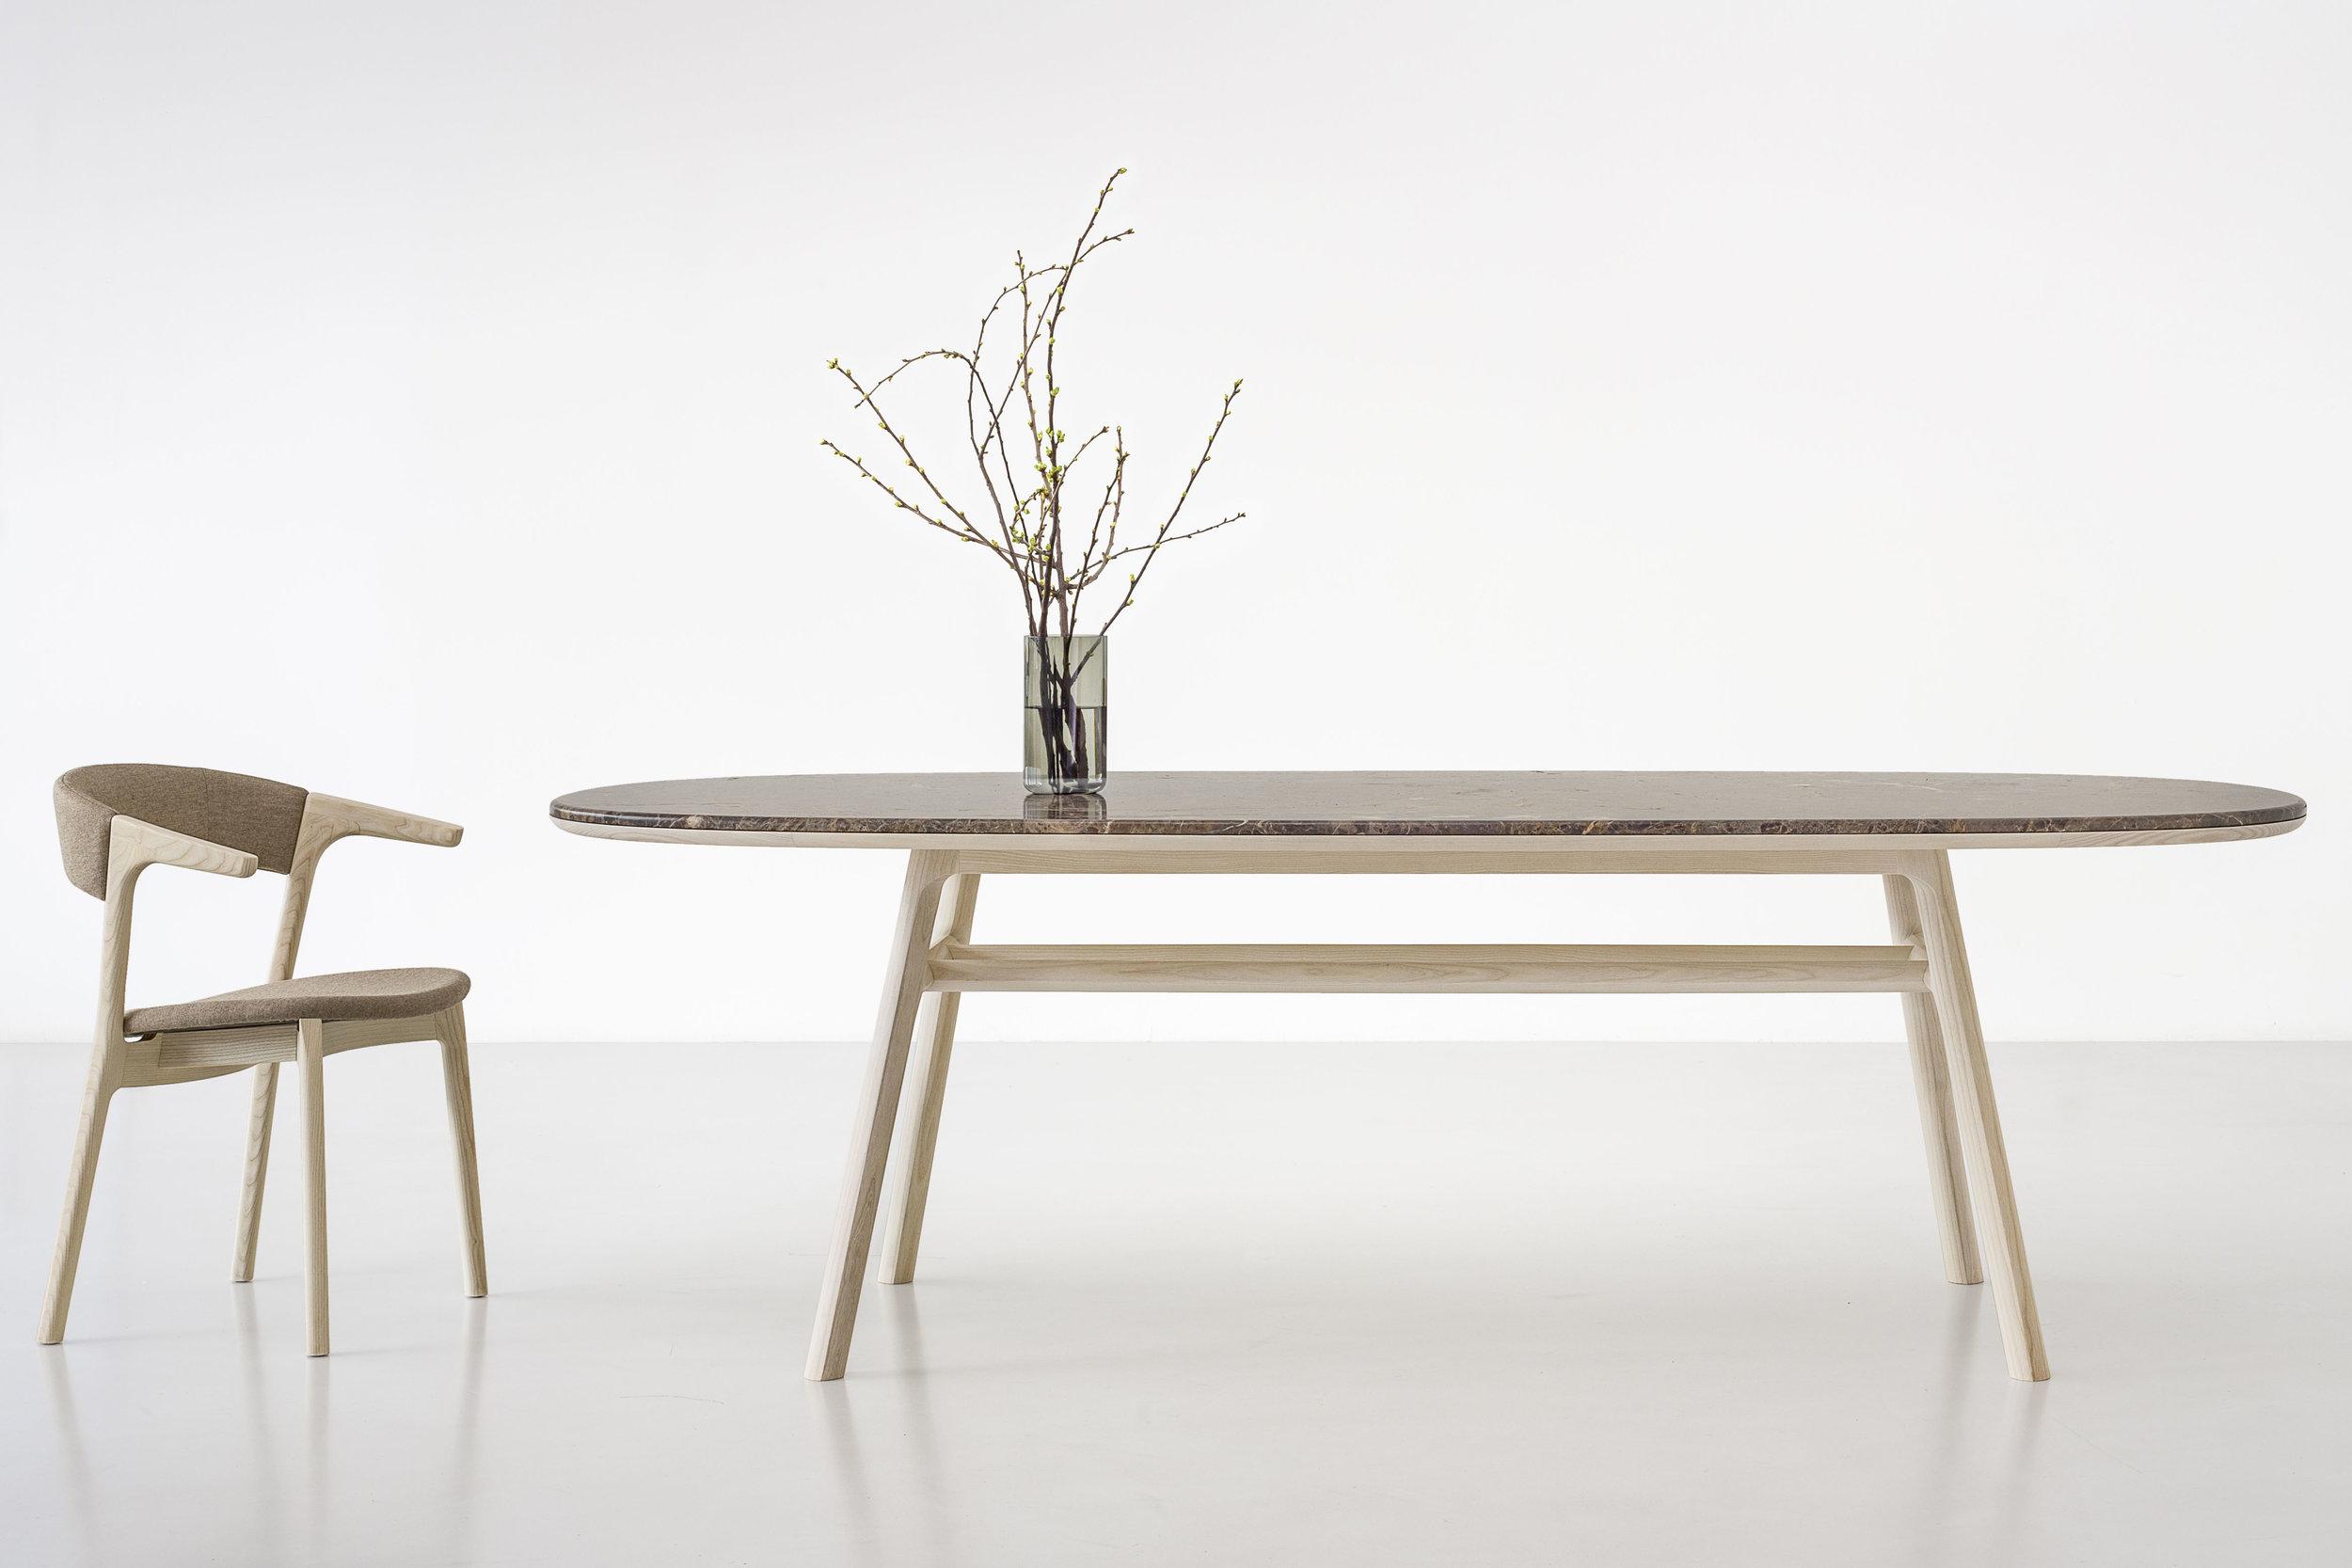 medeo-table_furniture-design_coordination-berlin_01.jpg